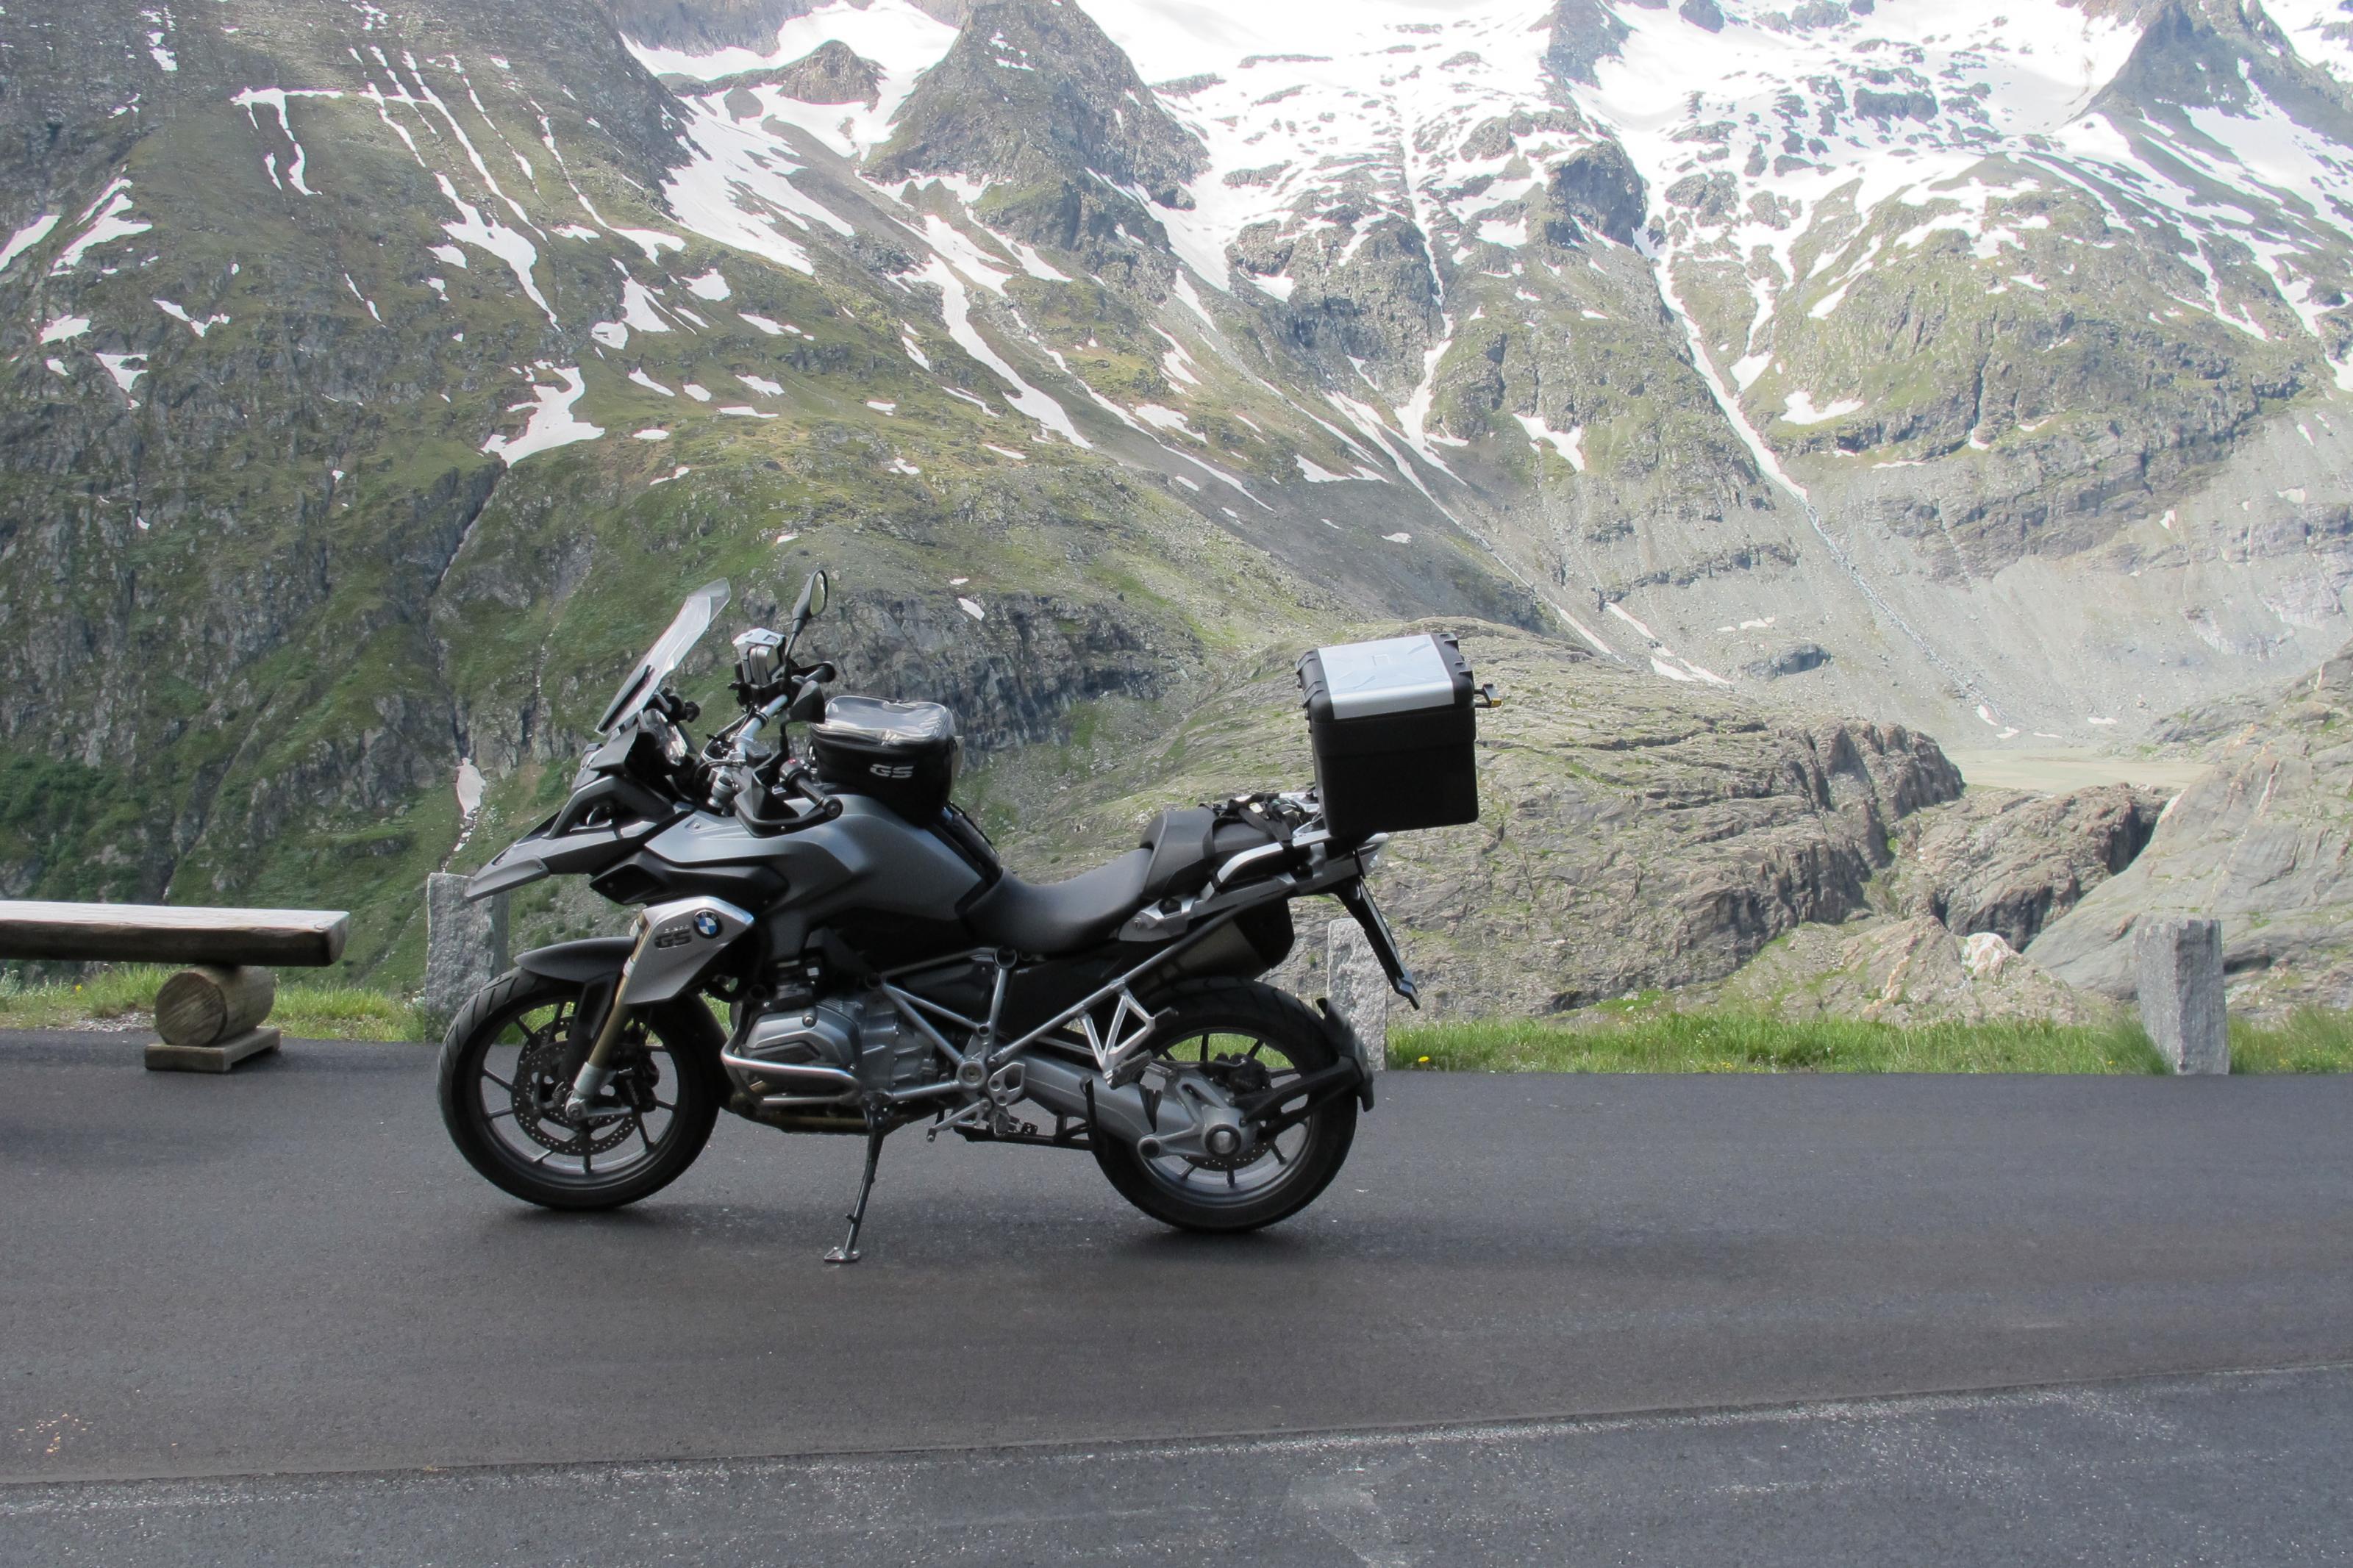 motorradtour-juni-2014-034.jpg